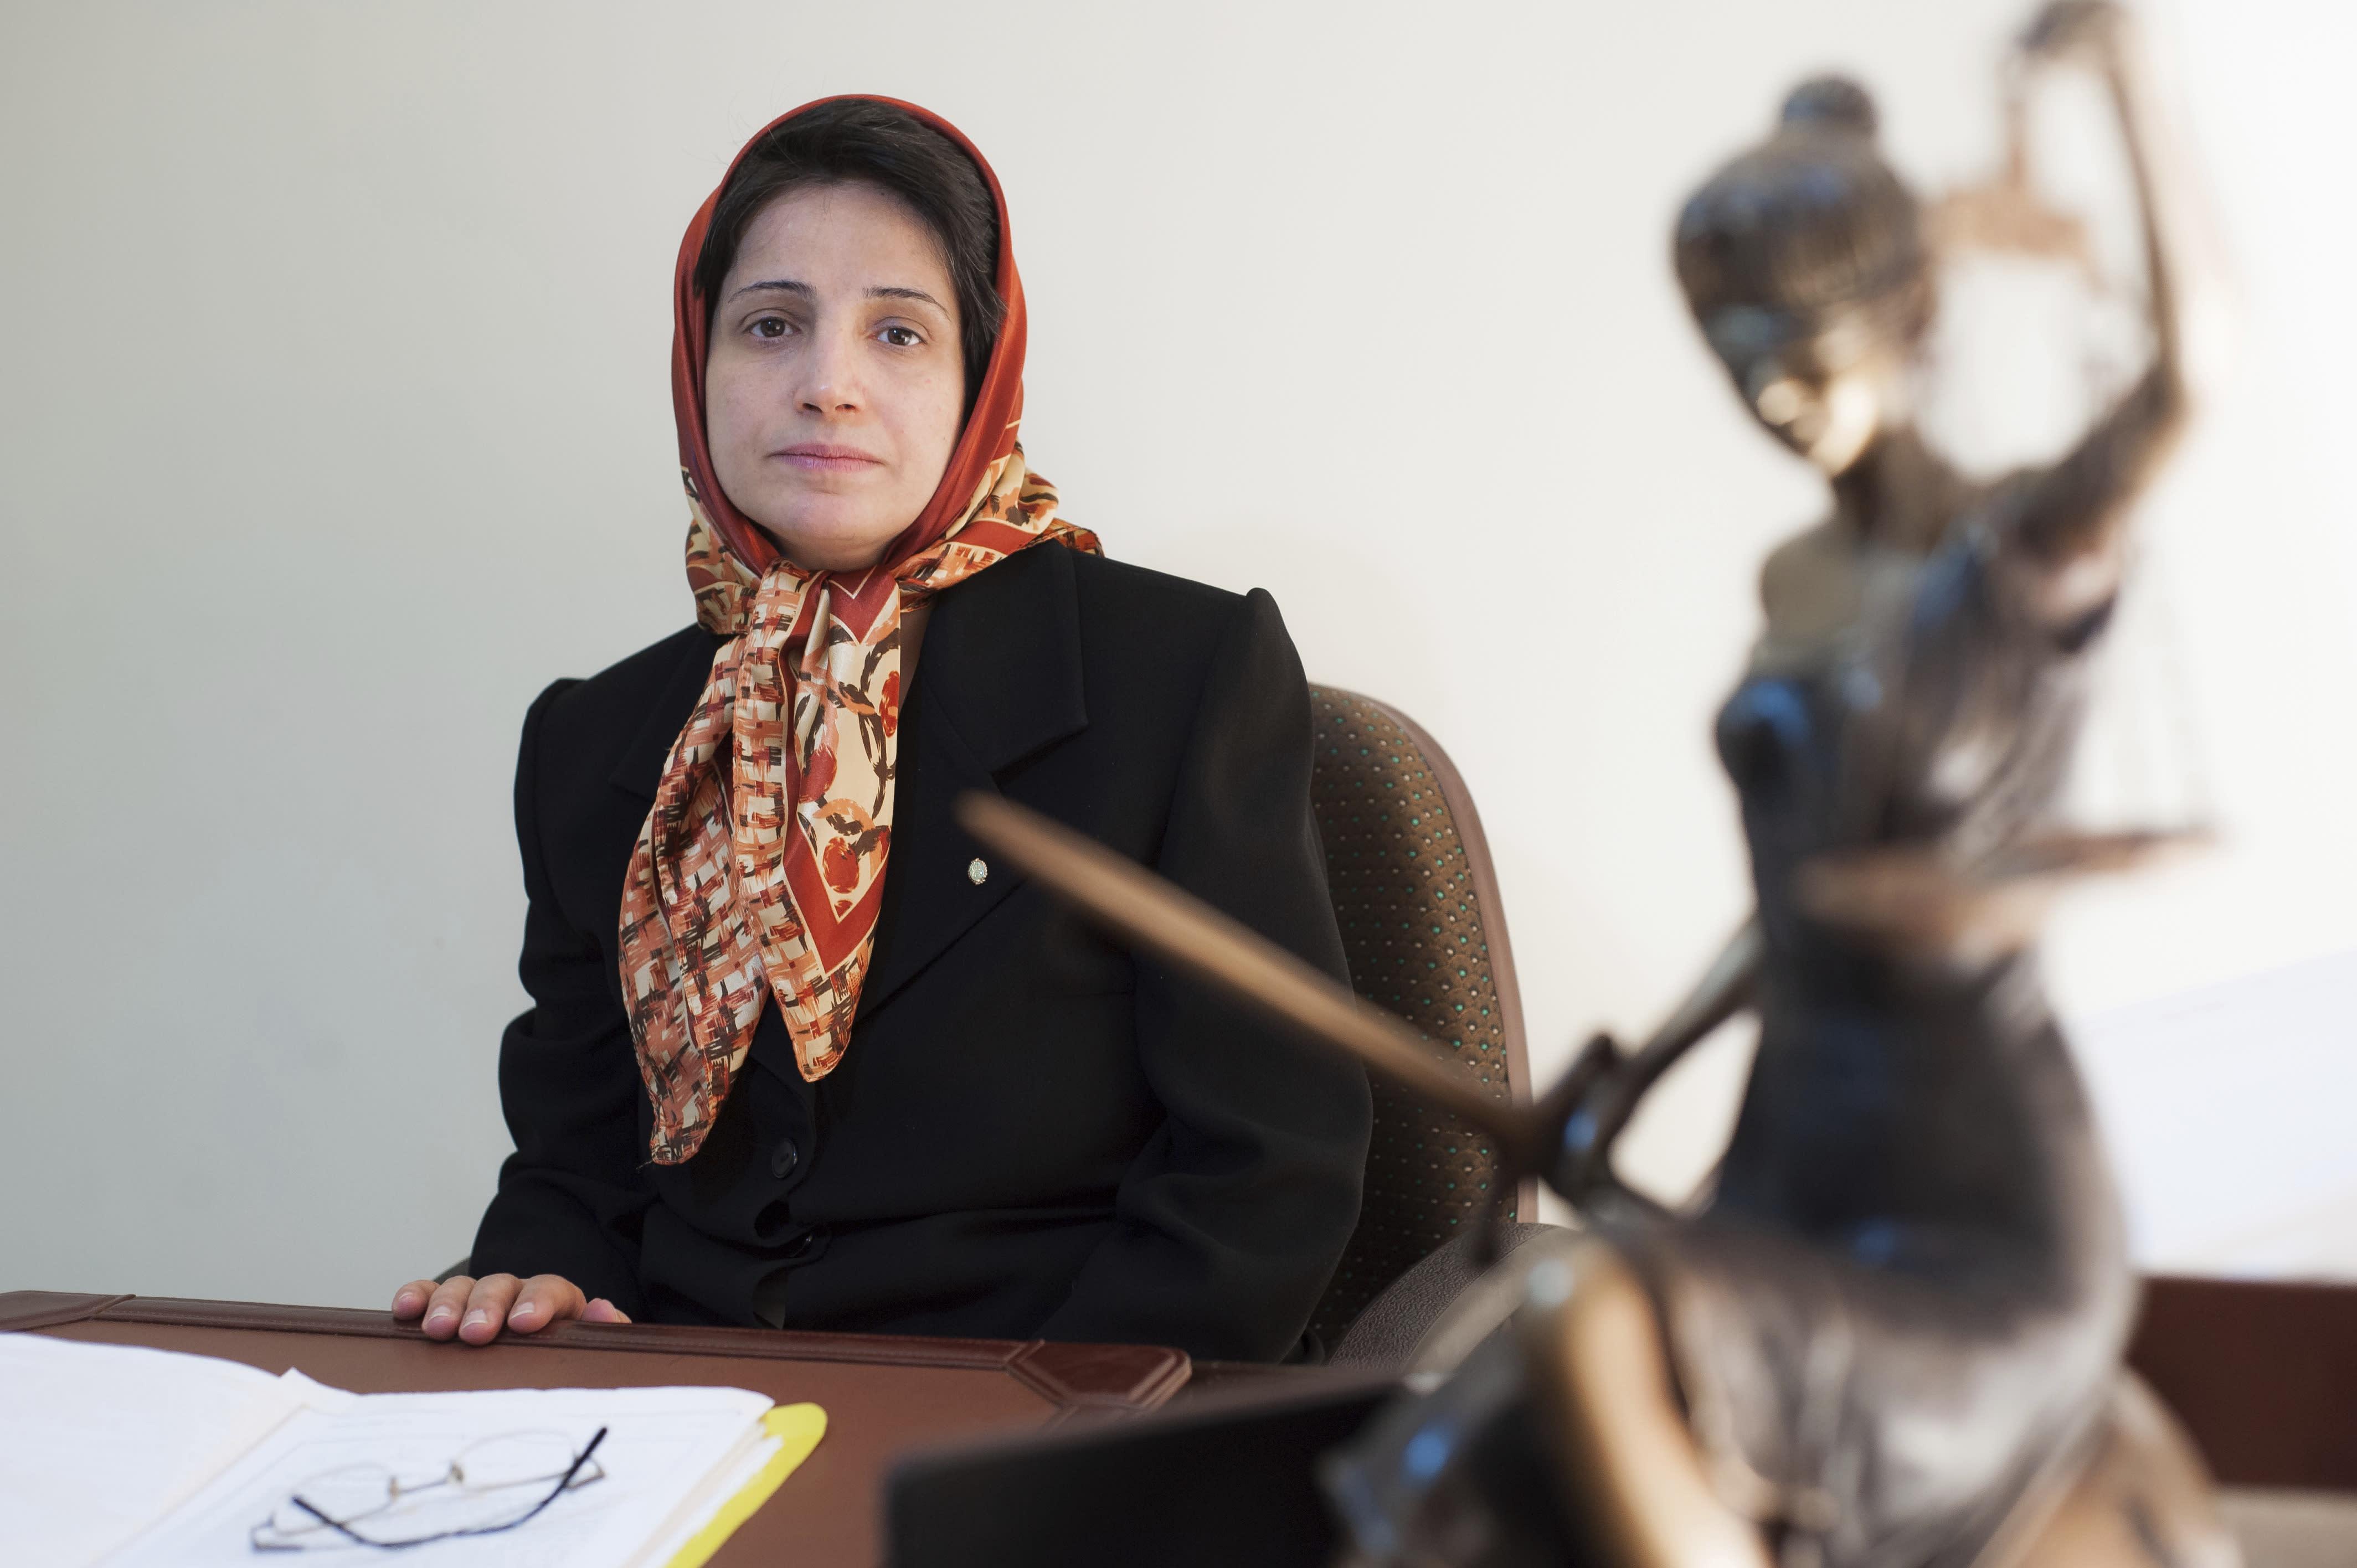 Jailed Iranian rights lawyer hospitalized amid hunger strike